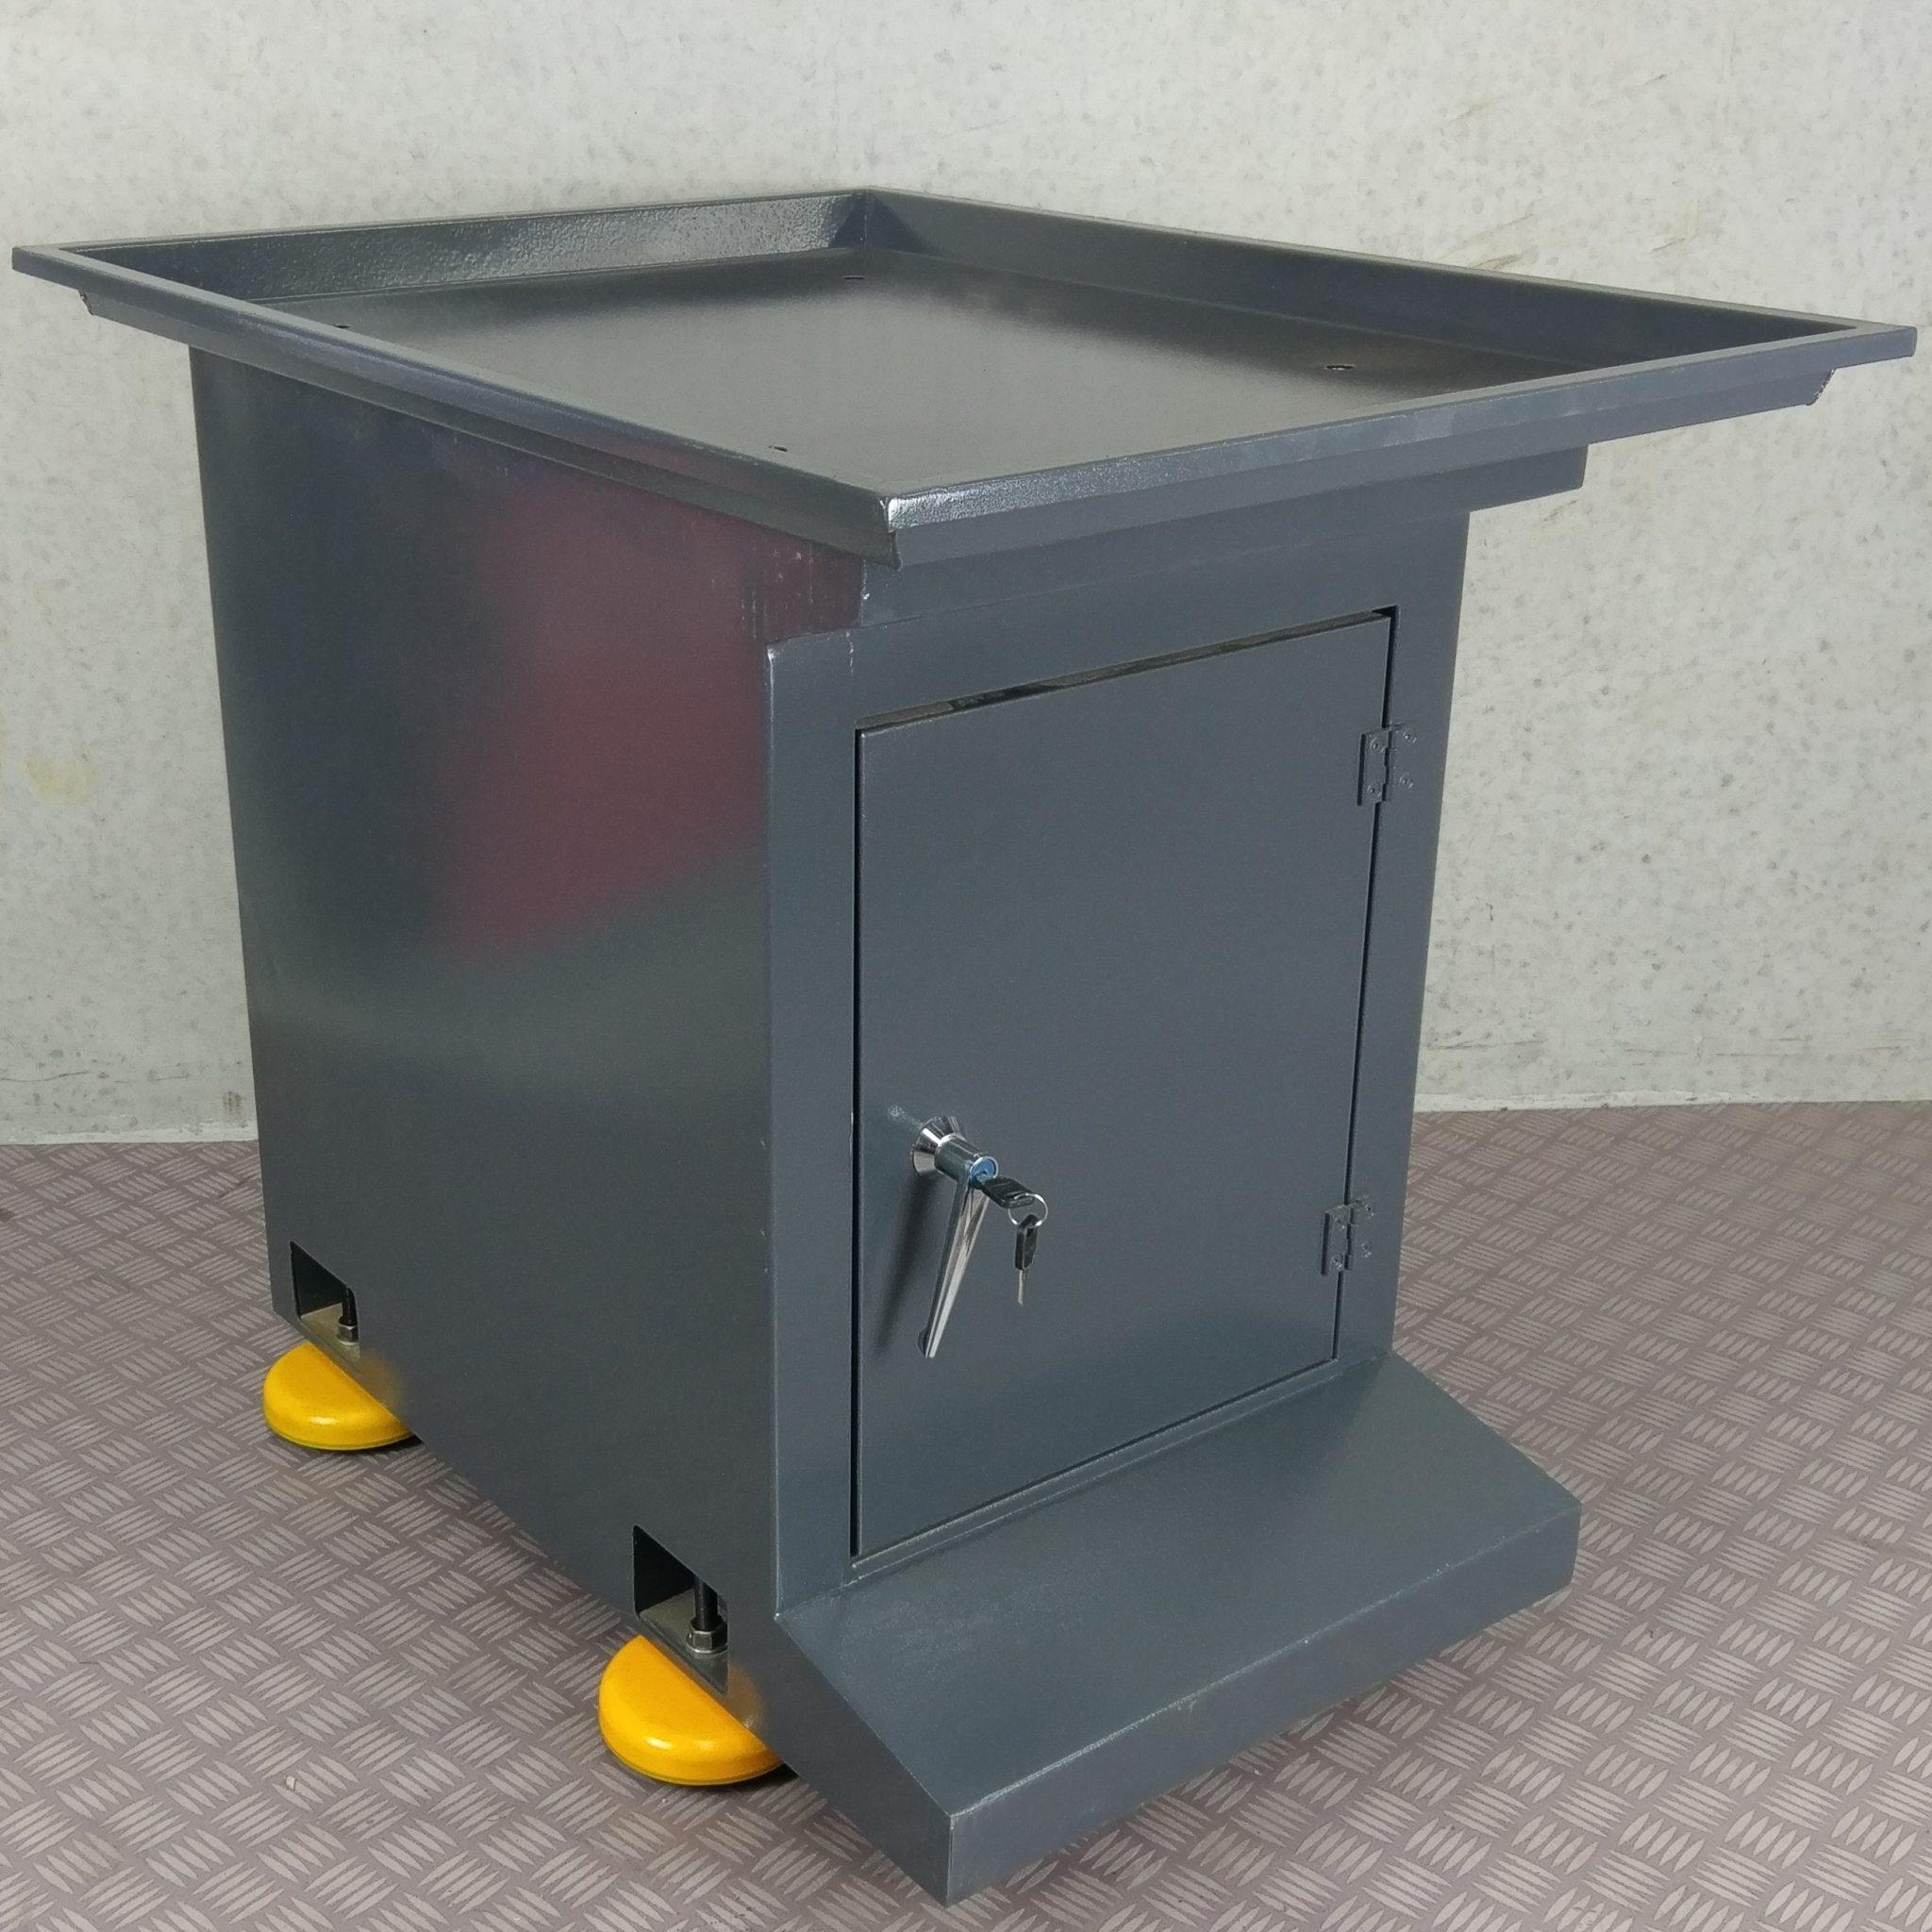 Metex Universal Milling Machine Stand Redfoxmachinery